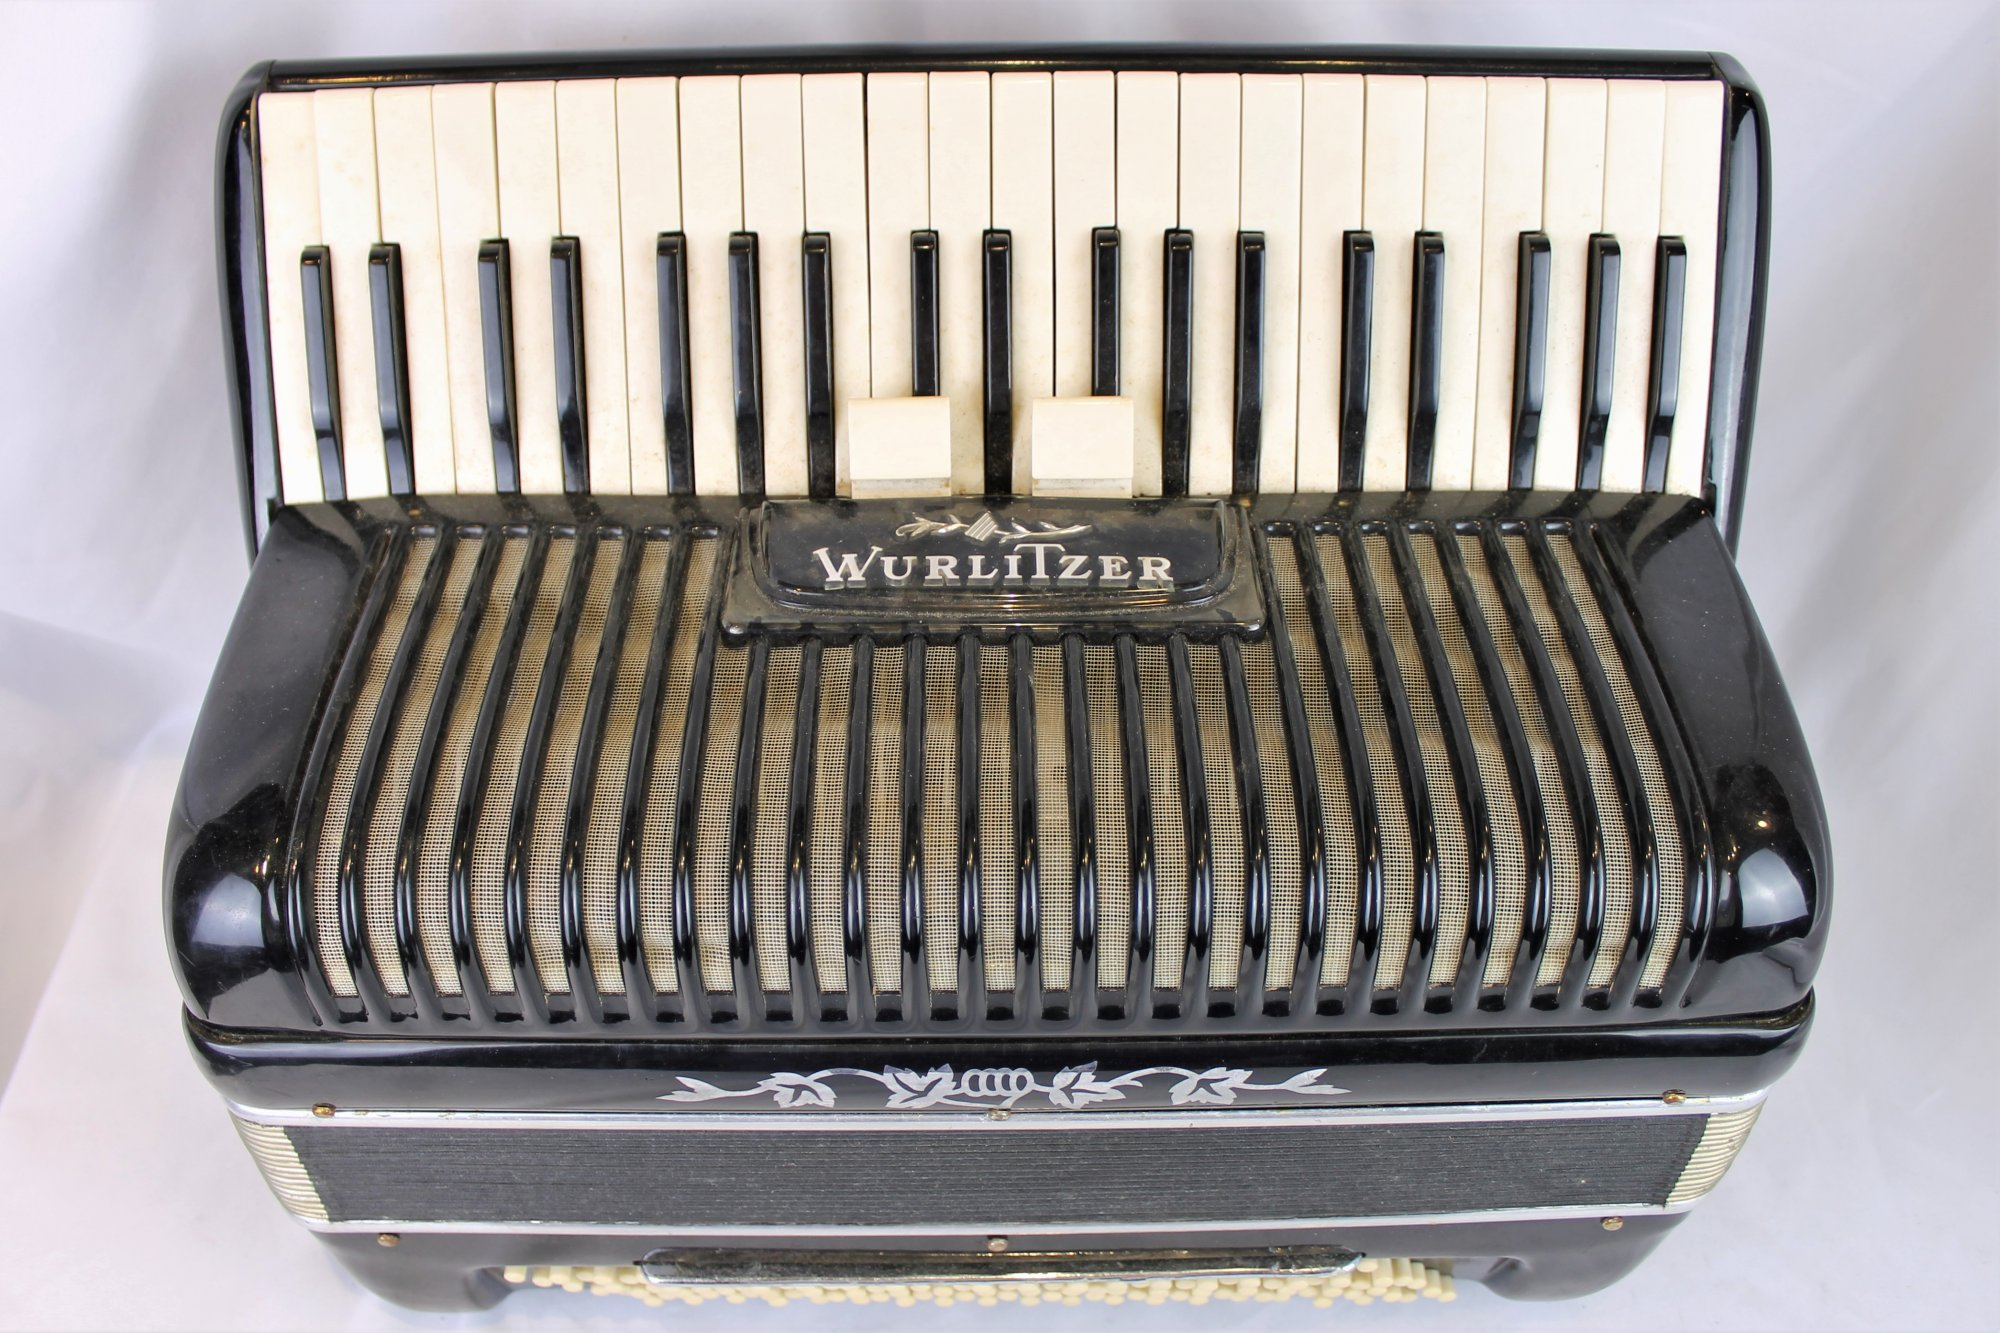 4863 - Black Wurlitzer Piano Accordion 41 120 - For Parts or Repair